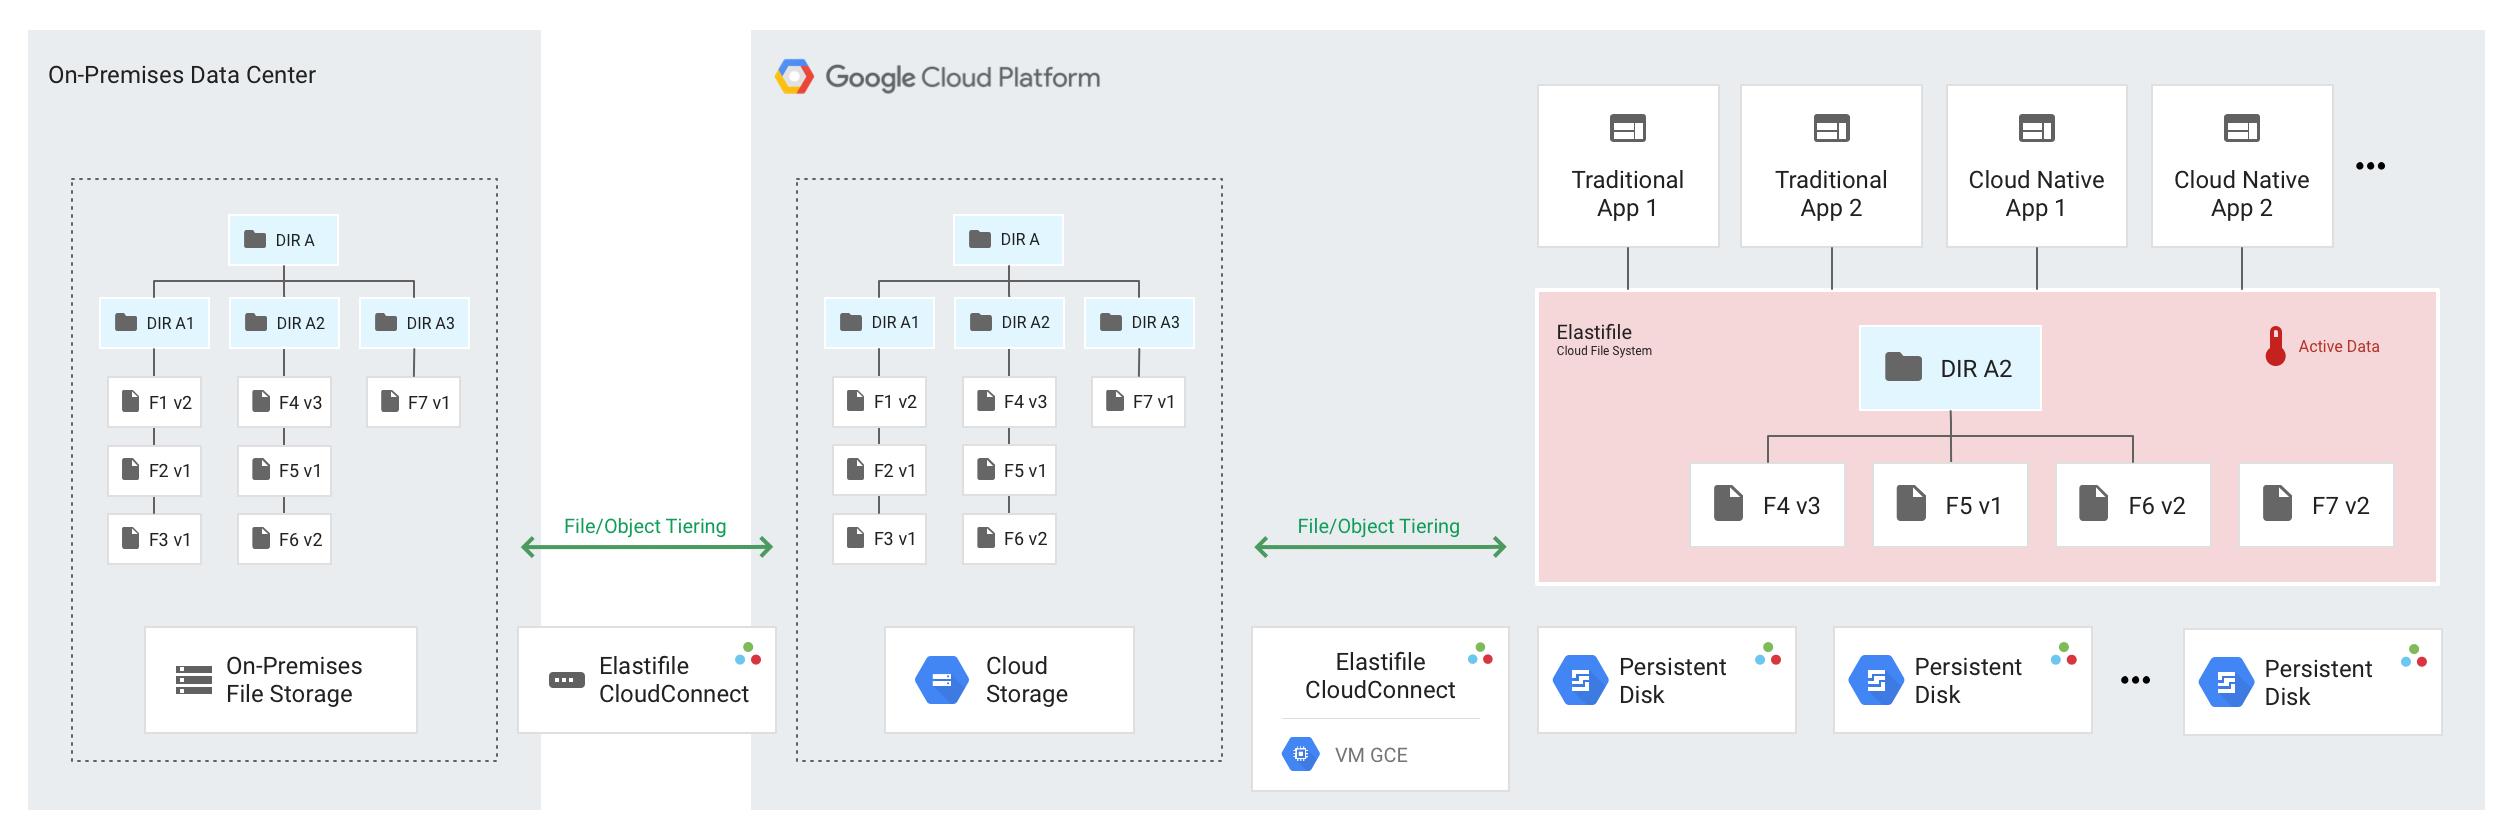 Diagram of Elastifile data storage and management